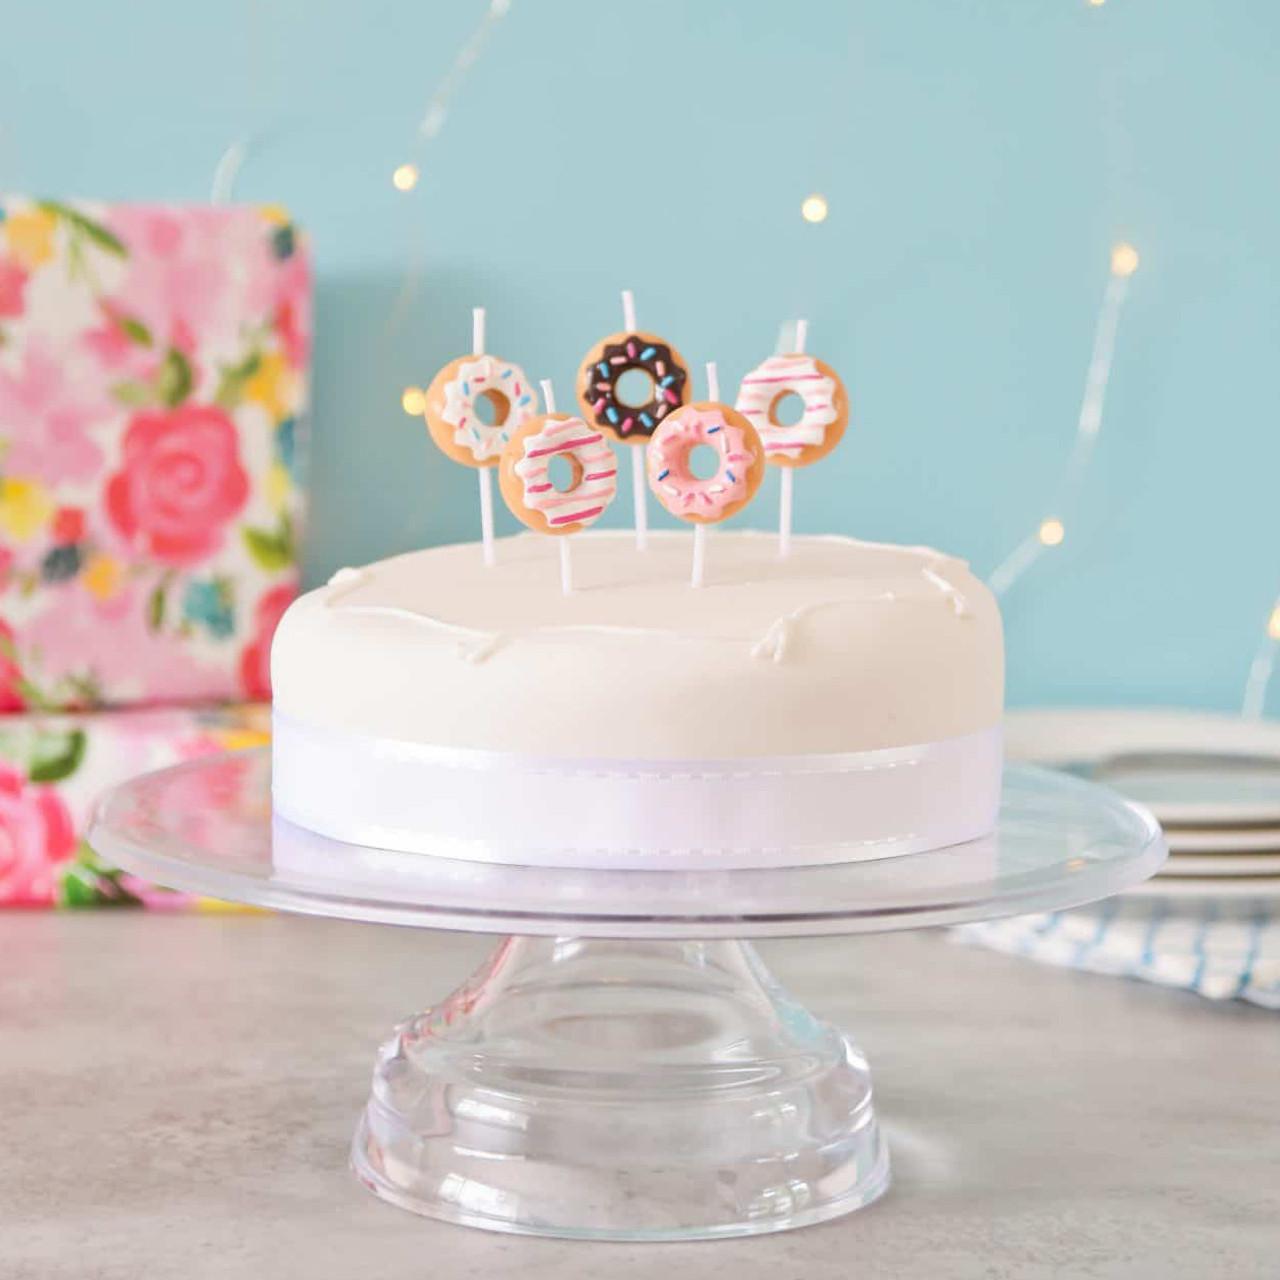 Astonishing Doughnut Birthday Cake Candles Funny Birthday Cards Online Alyptdamsfinfo